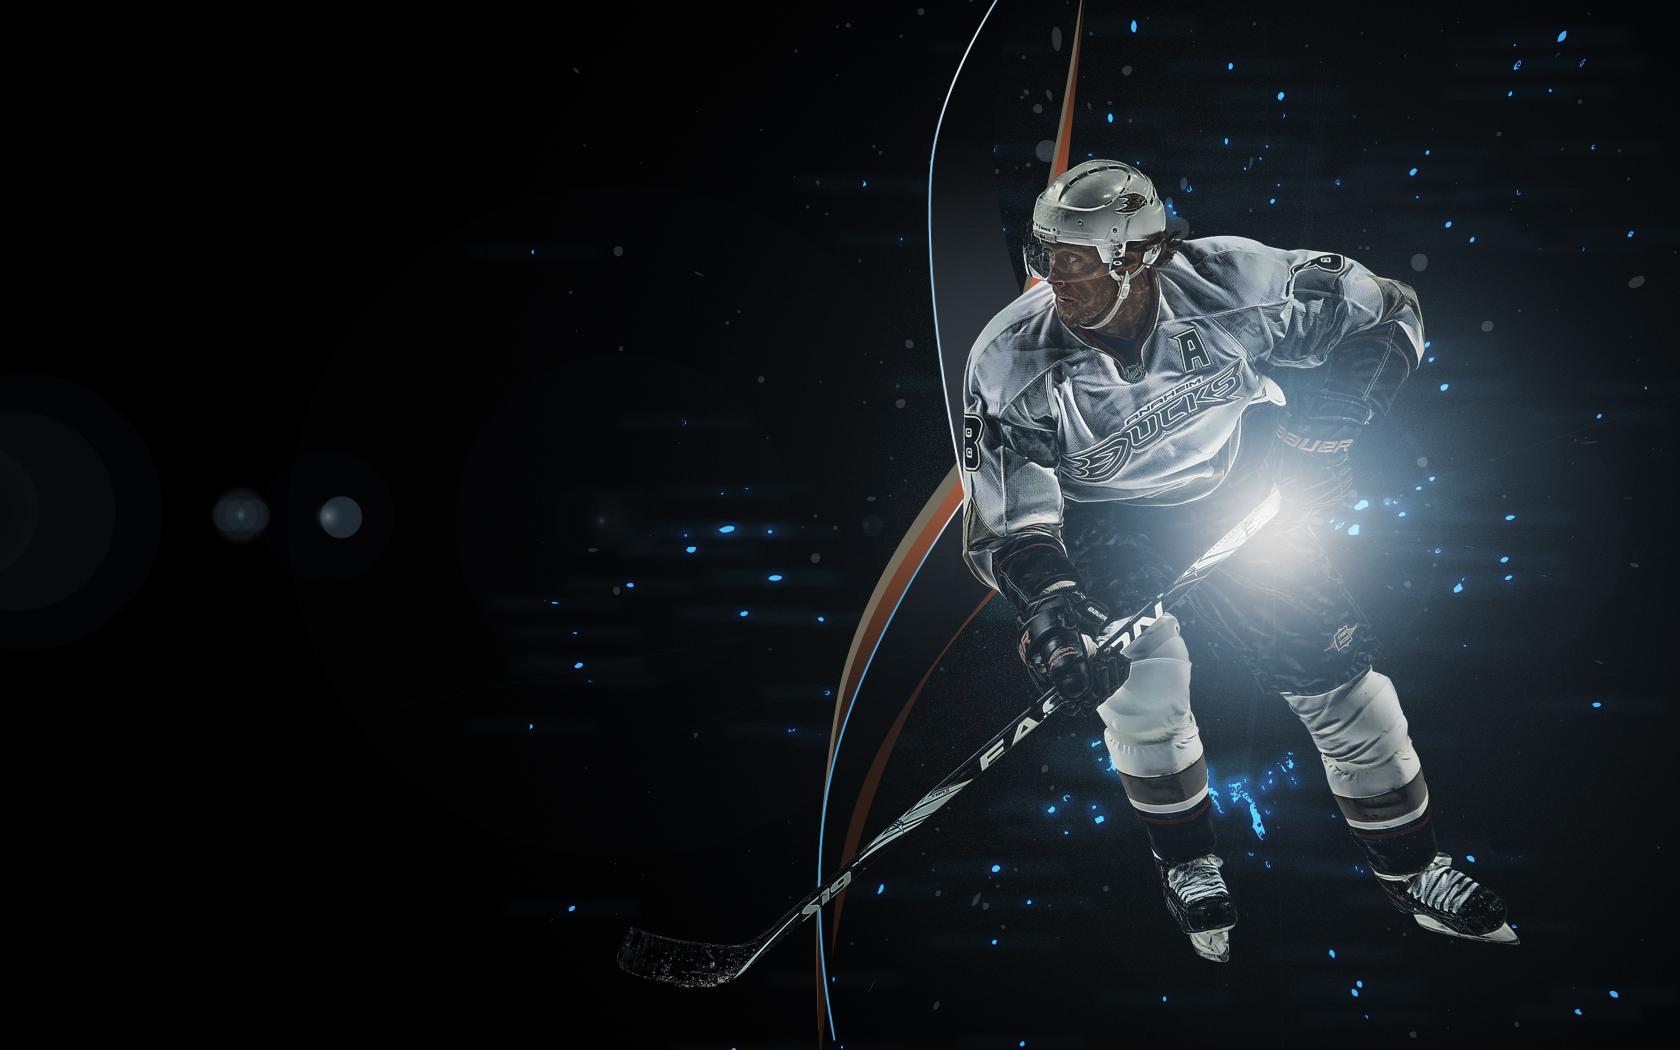 Teemu selanne anaheim ducks hockey nhl black wallpaper - Nhl hockey wallpapers ...